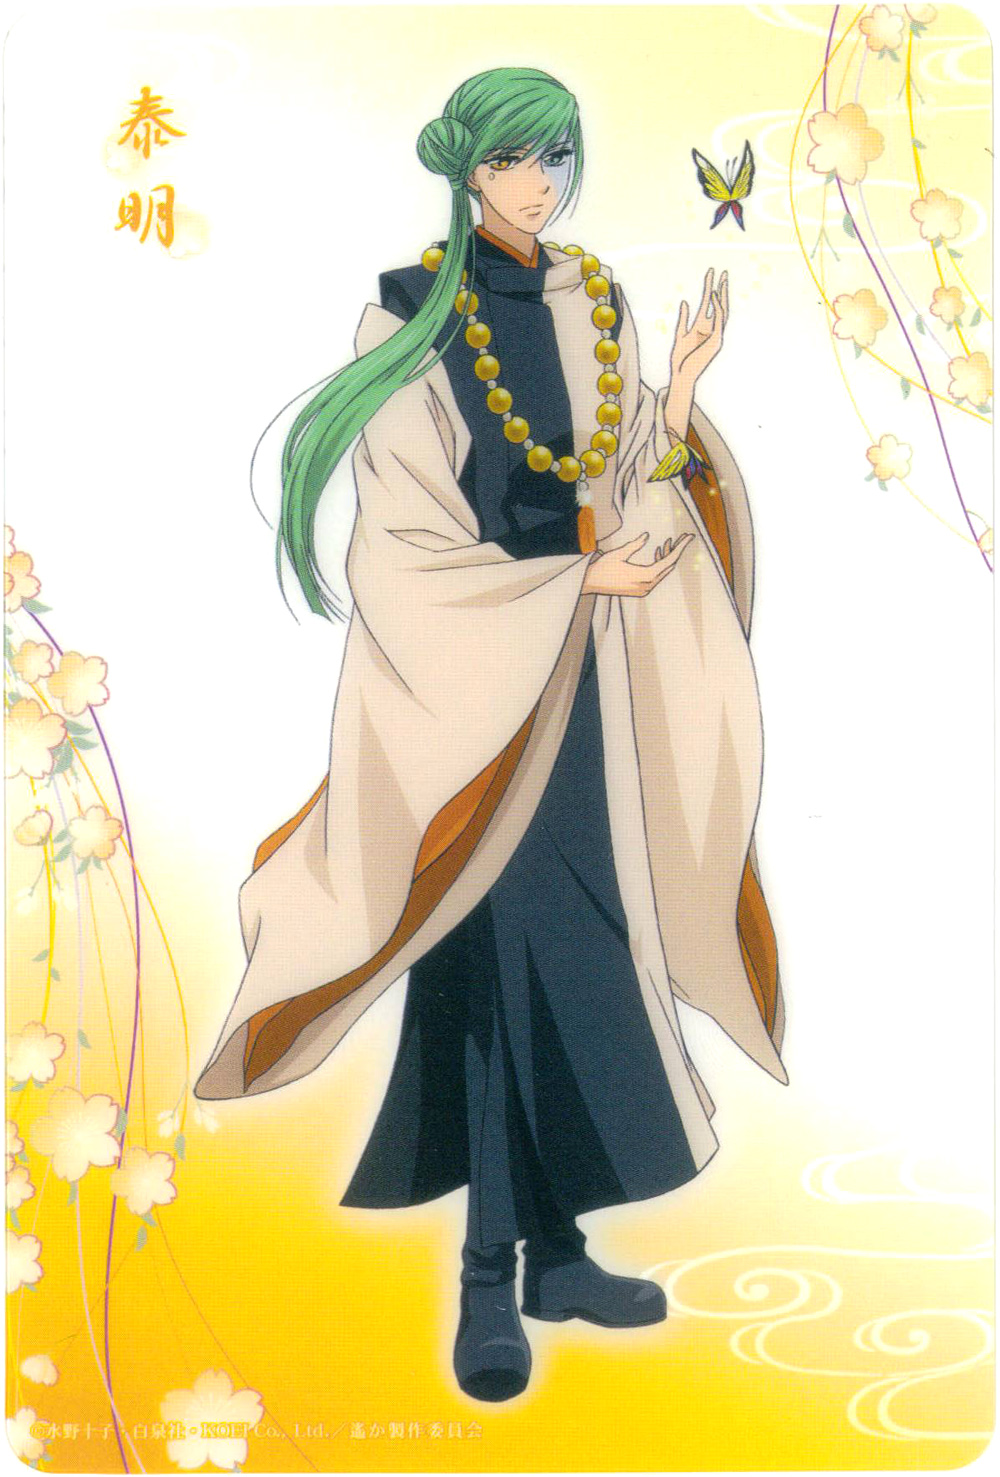 Abe no Yasuaki/#228482 - Zerochan